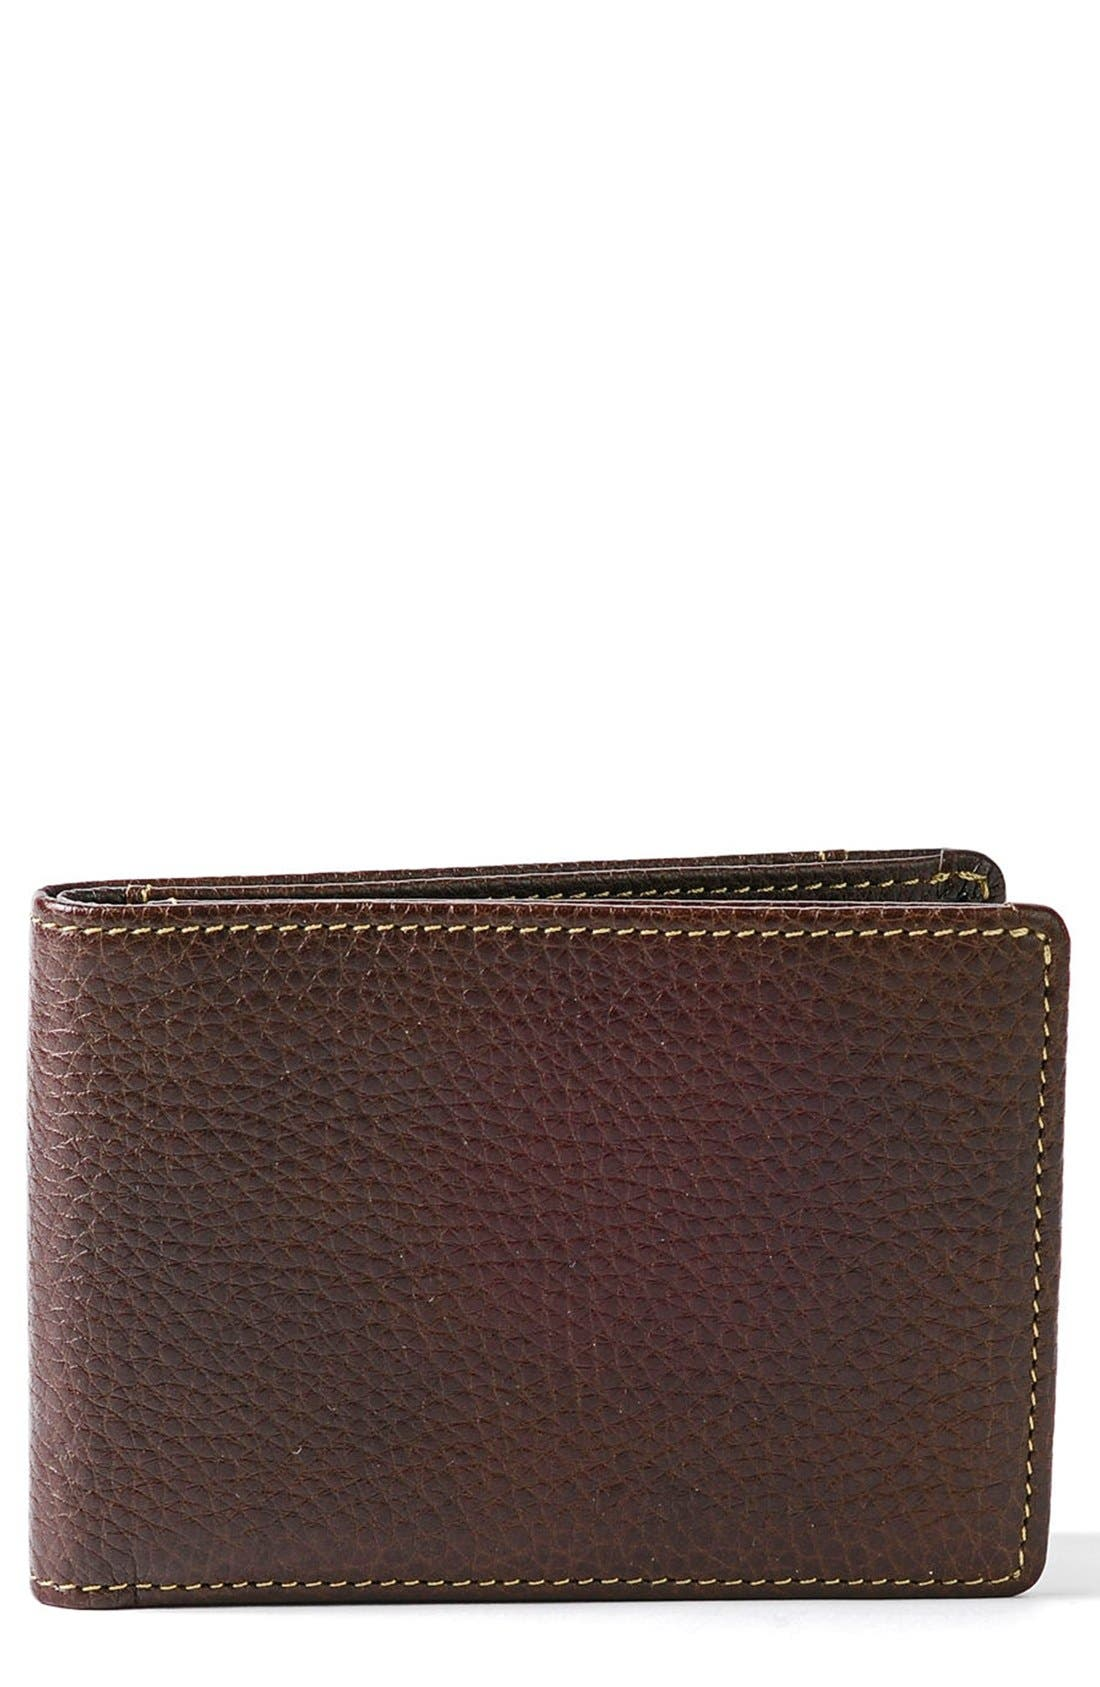 'Tyler' RFID Slimster Wallet,                         Main,                         color, Coffee